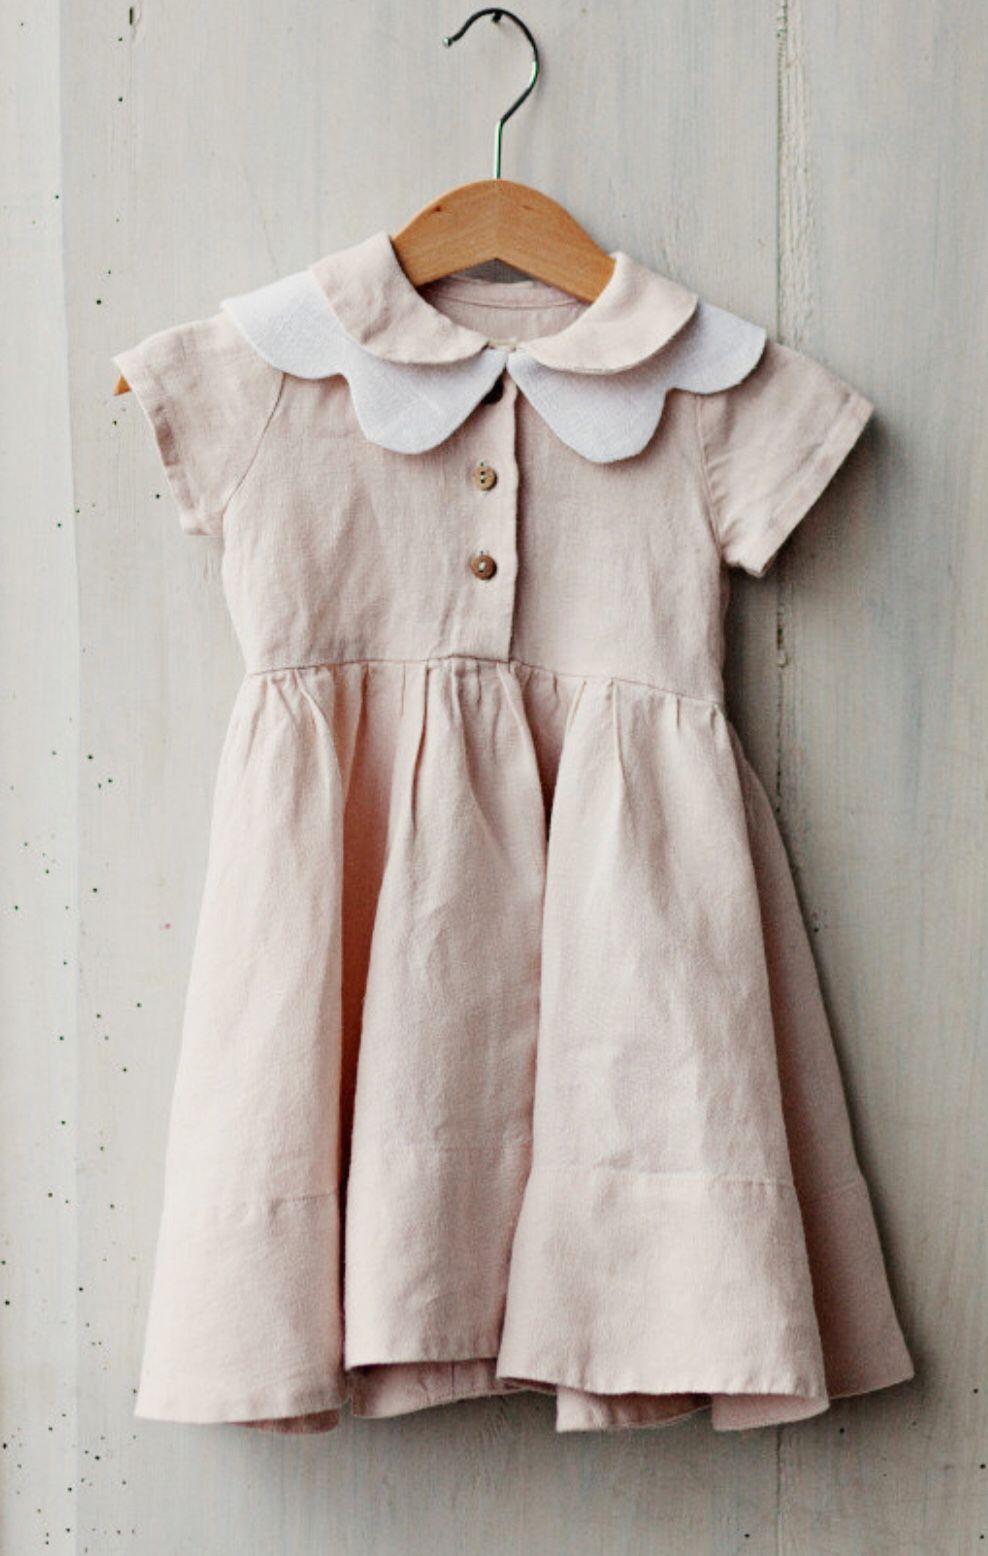 21756dc3a Girls Handmade Vintage Style Linen Dress & Butterfly Collar   SondeflorShop  on Etsy